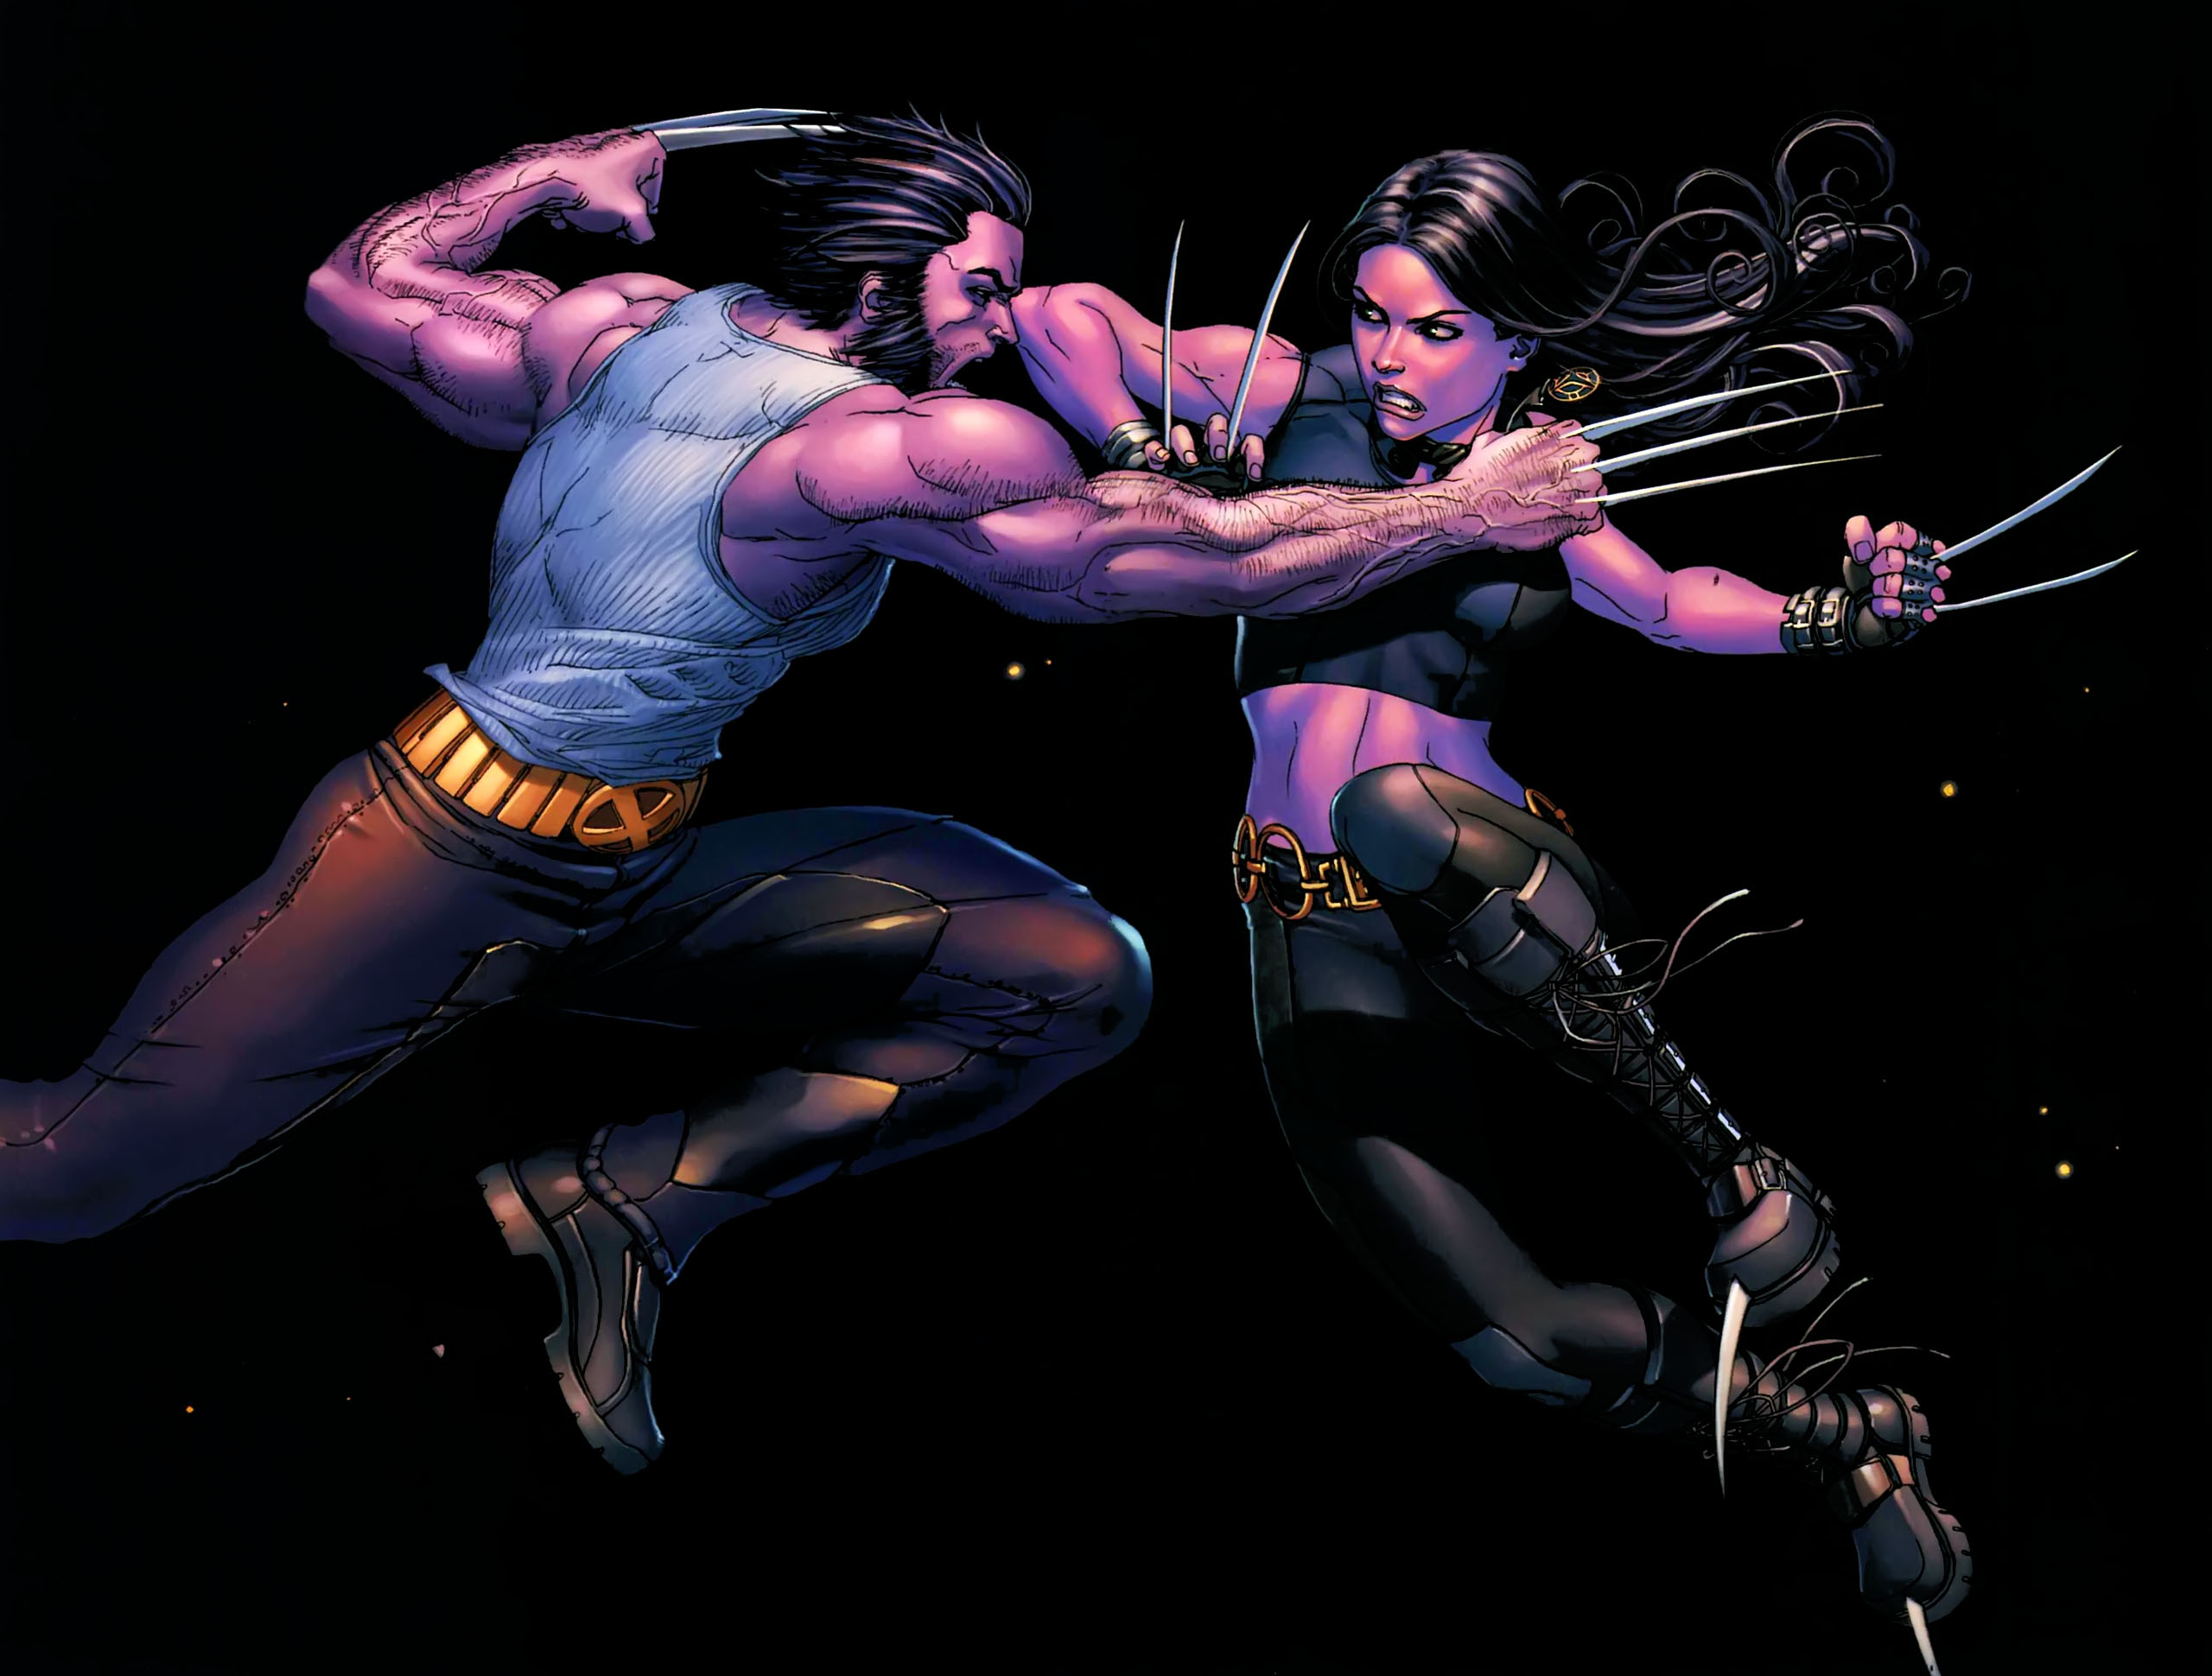 Comic Marvel Comics Superhero Wolverine X 23 2560x1940